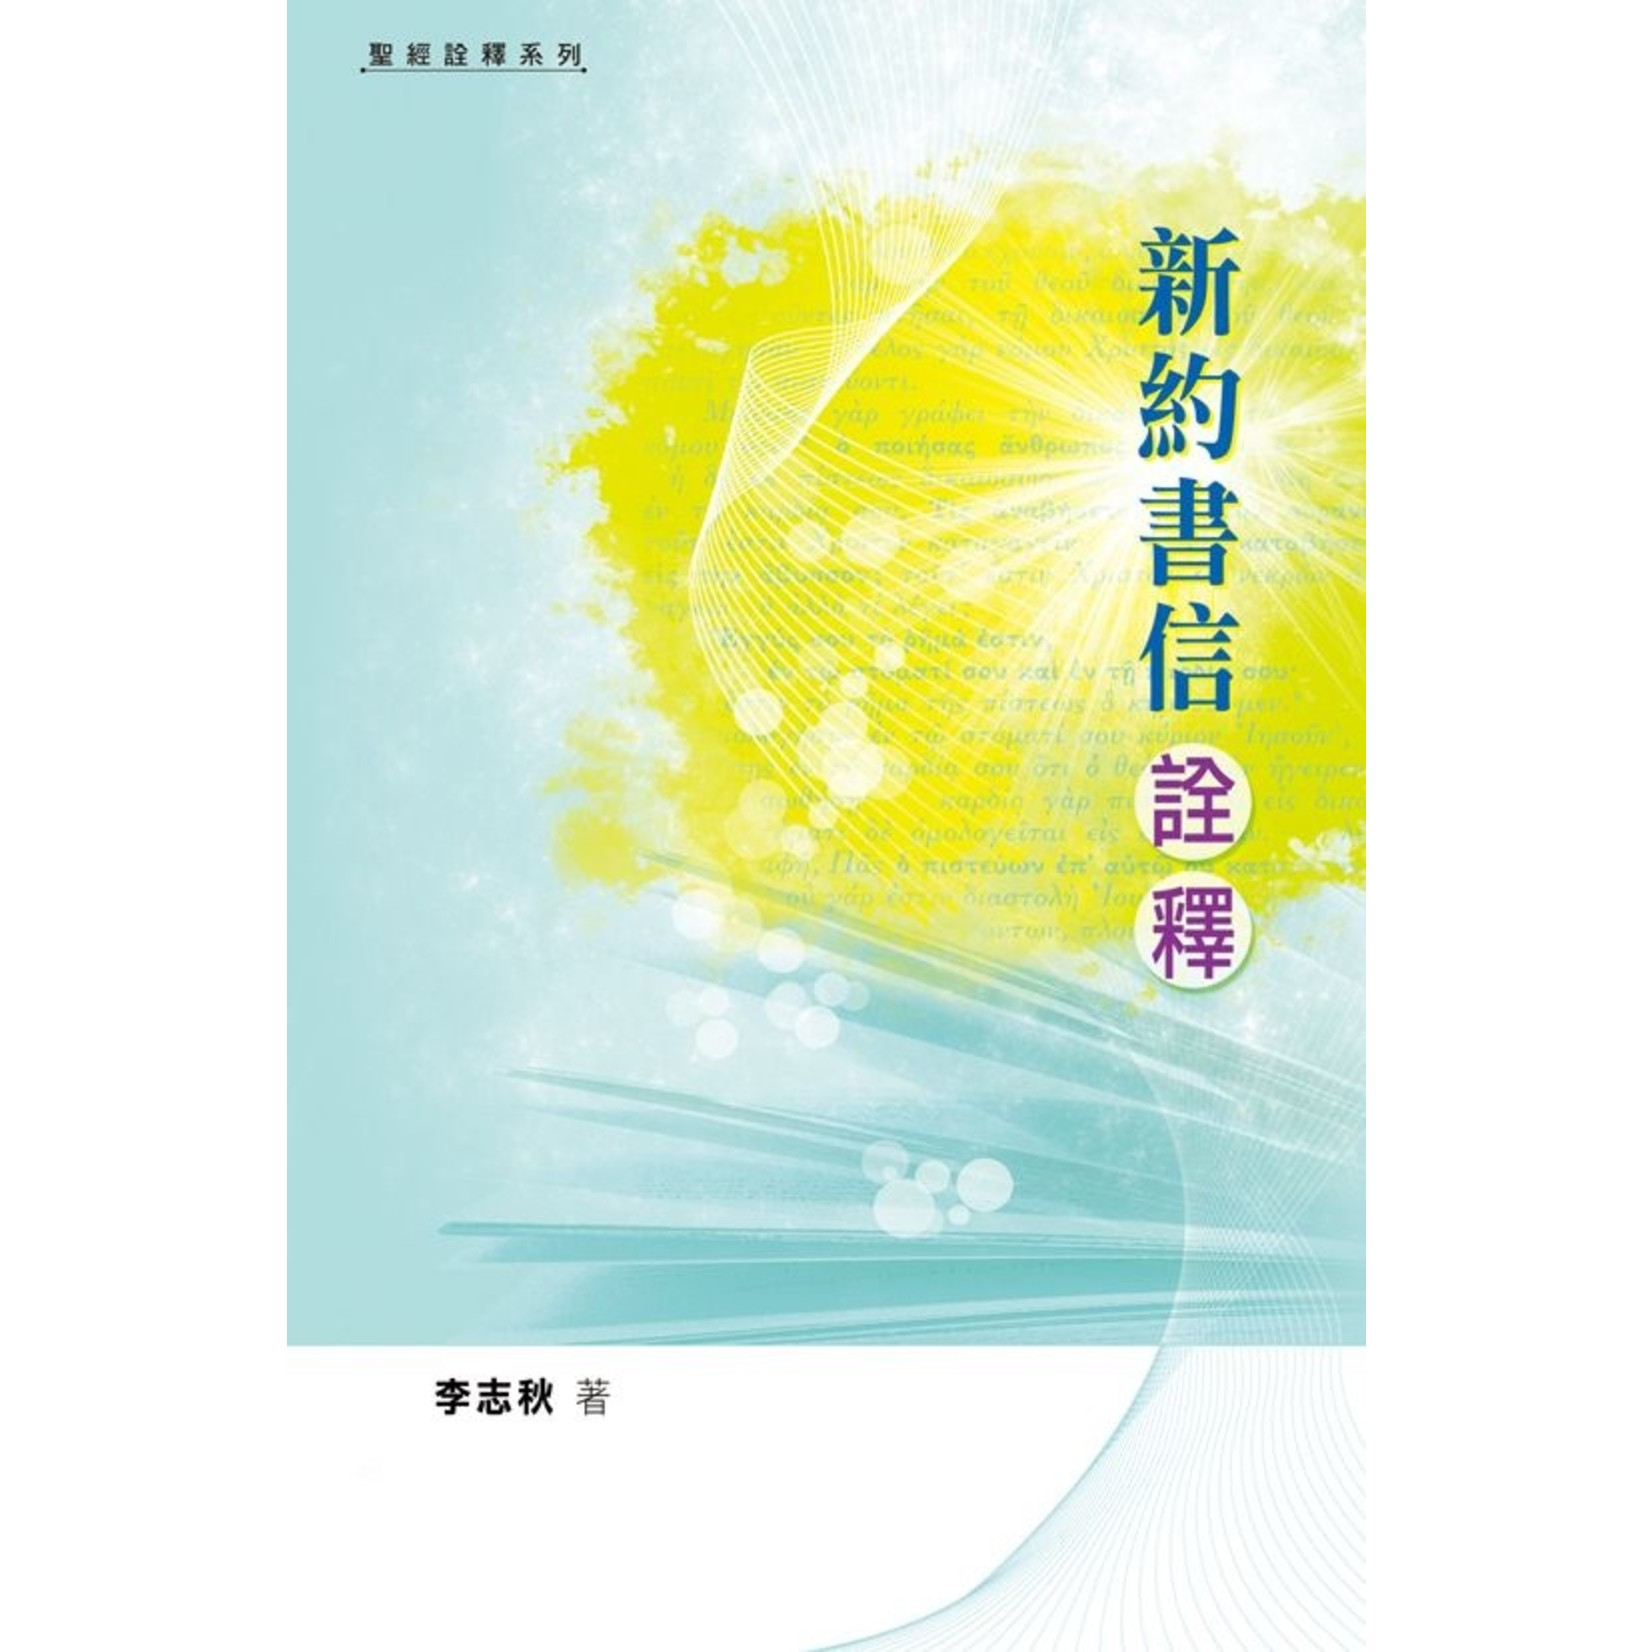 天道書樓 Tien Dao Publishing House 新約書信詮釋